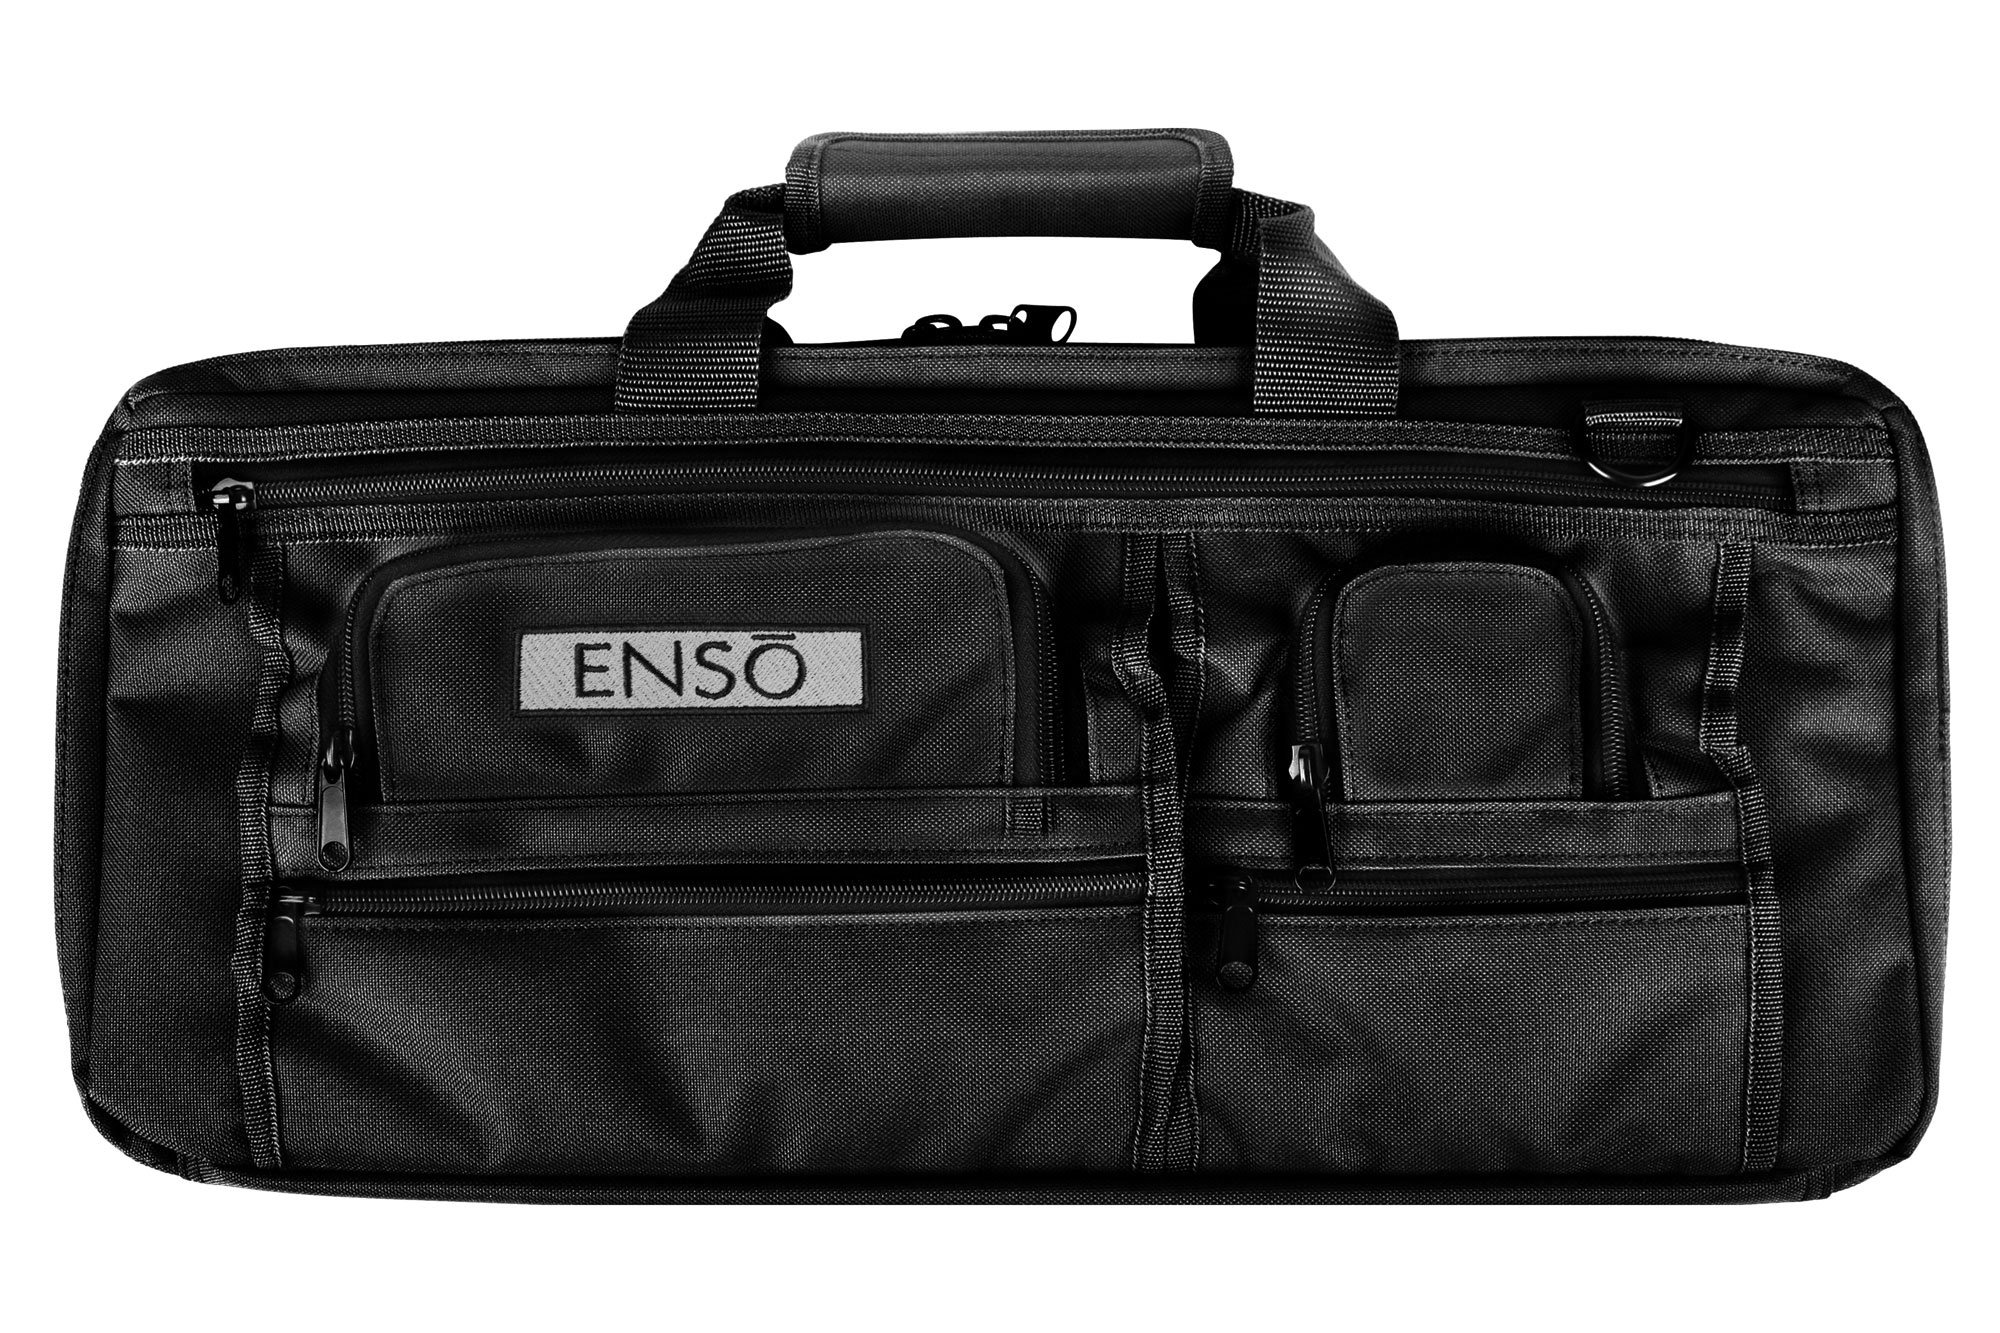 Enso Chef Knife Bag - 18 Pocket Professional Chefs Case - Canvas, Black